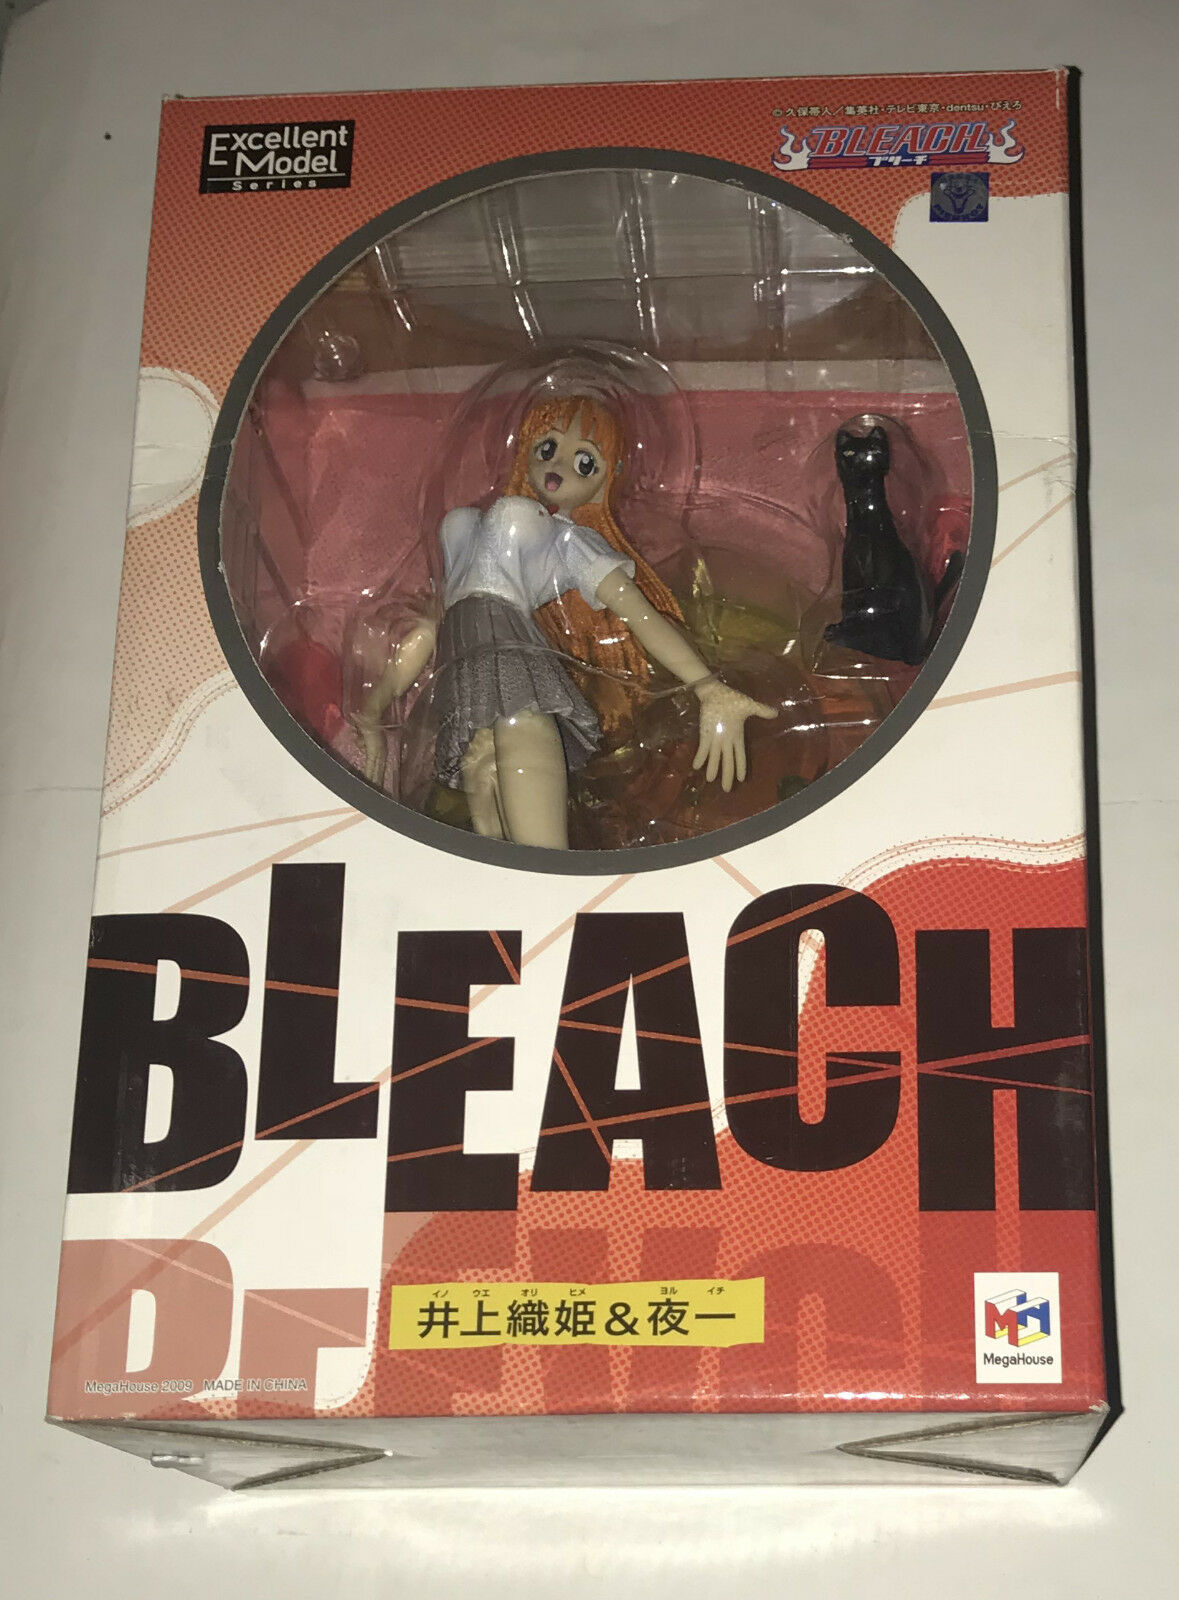 BLEACH Excellent modellolo Inoue Orihime 1 8 PVC cifra (MegaHouse)